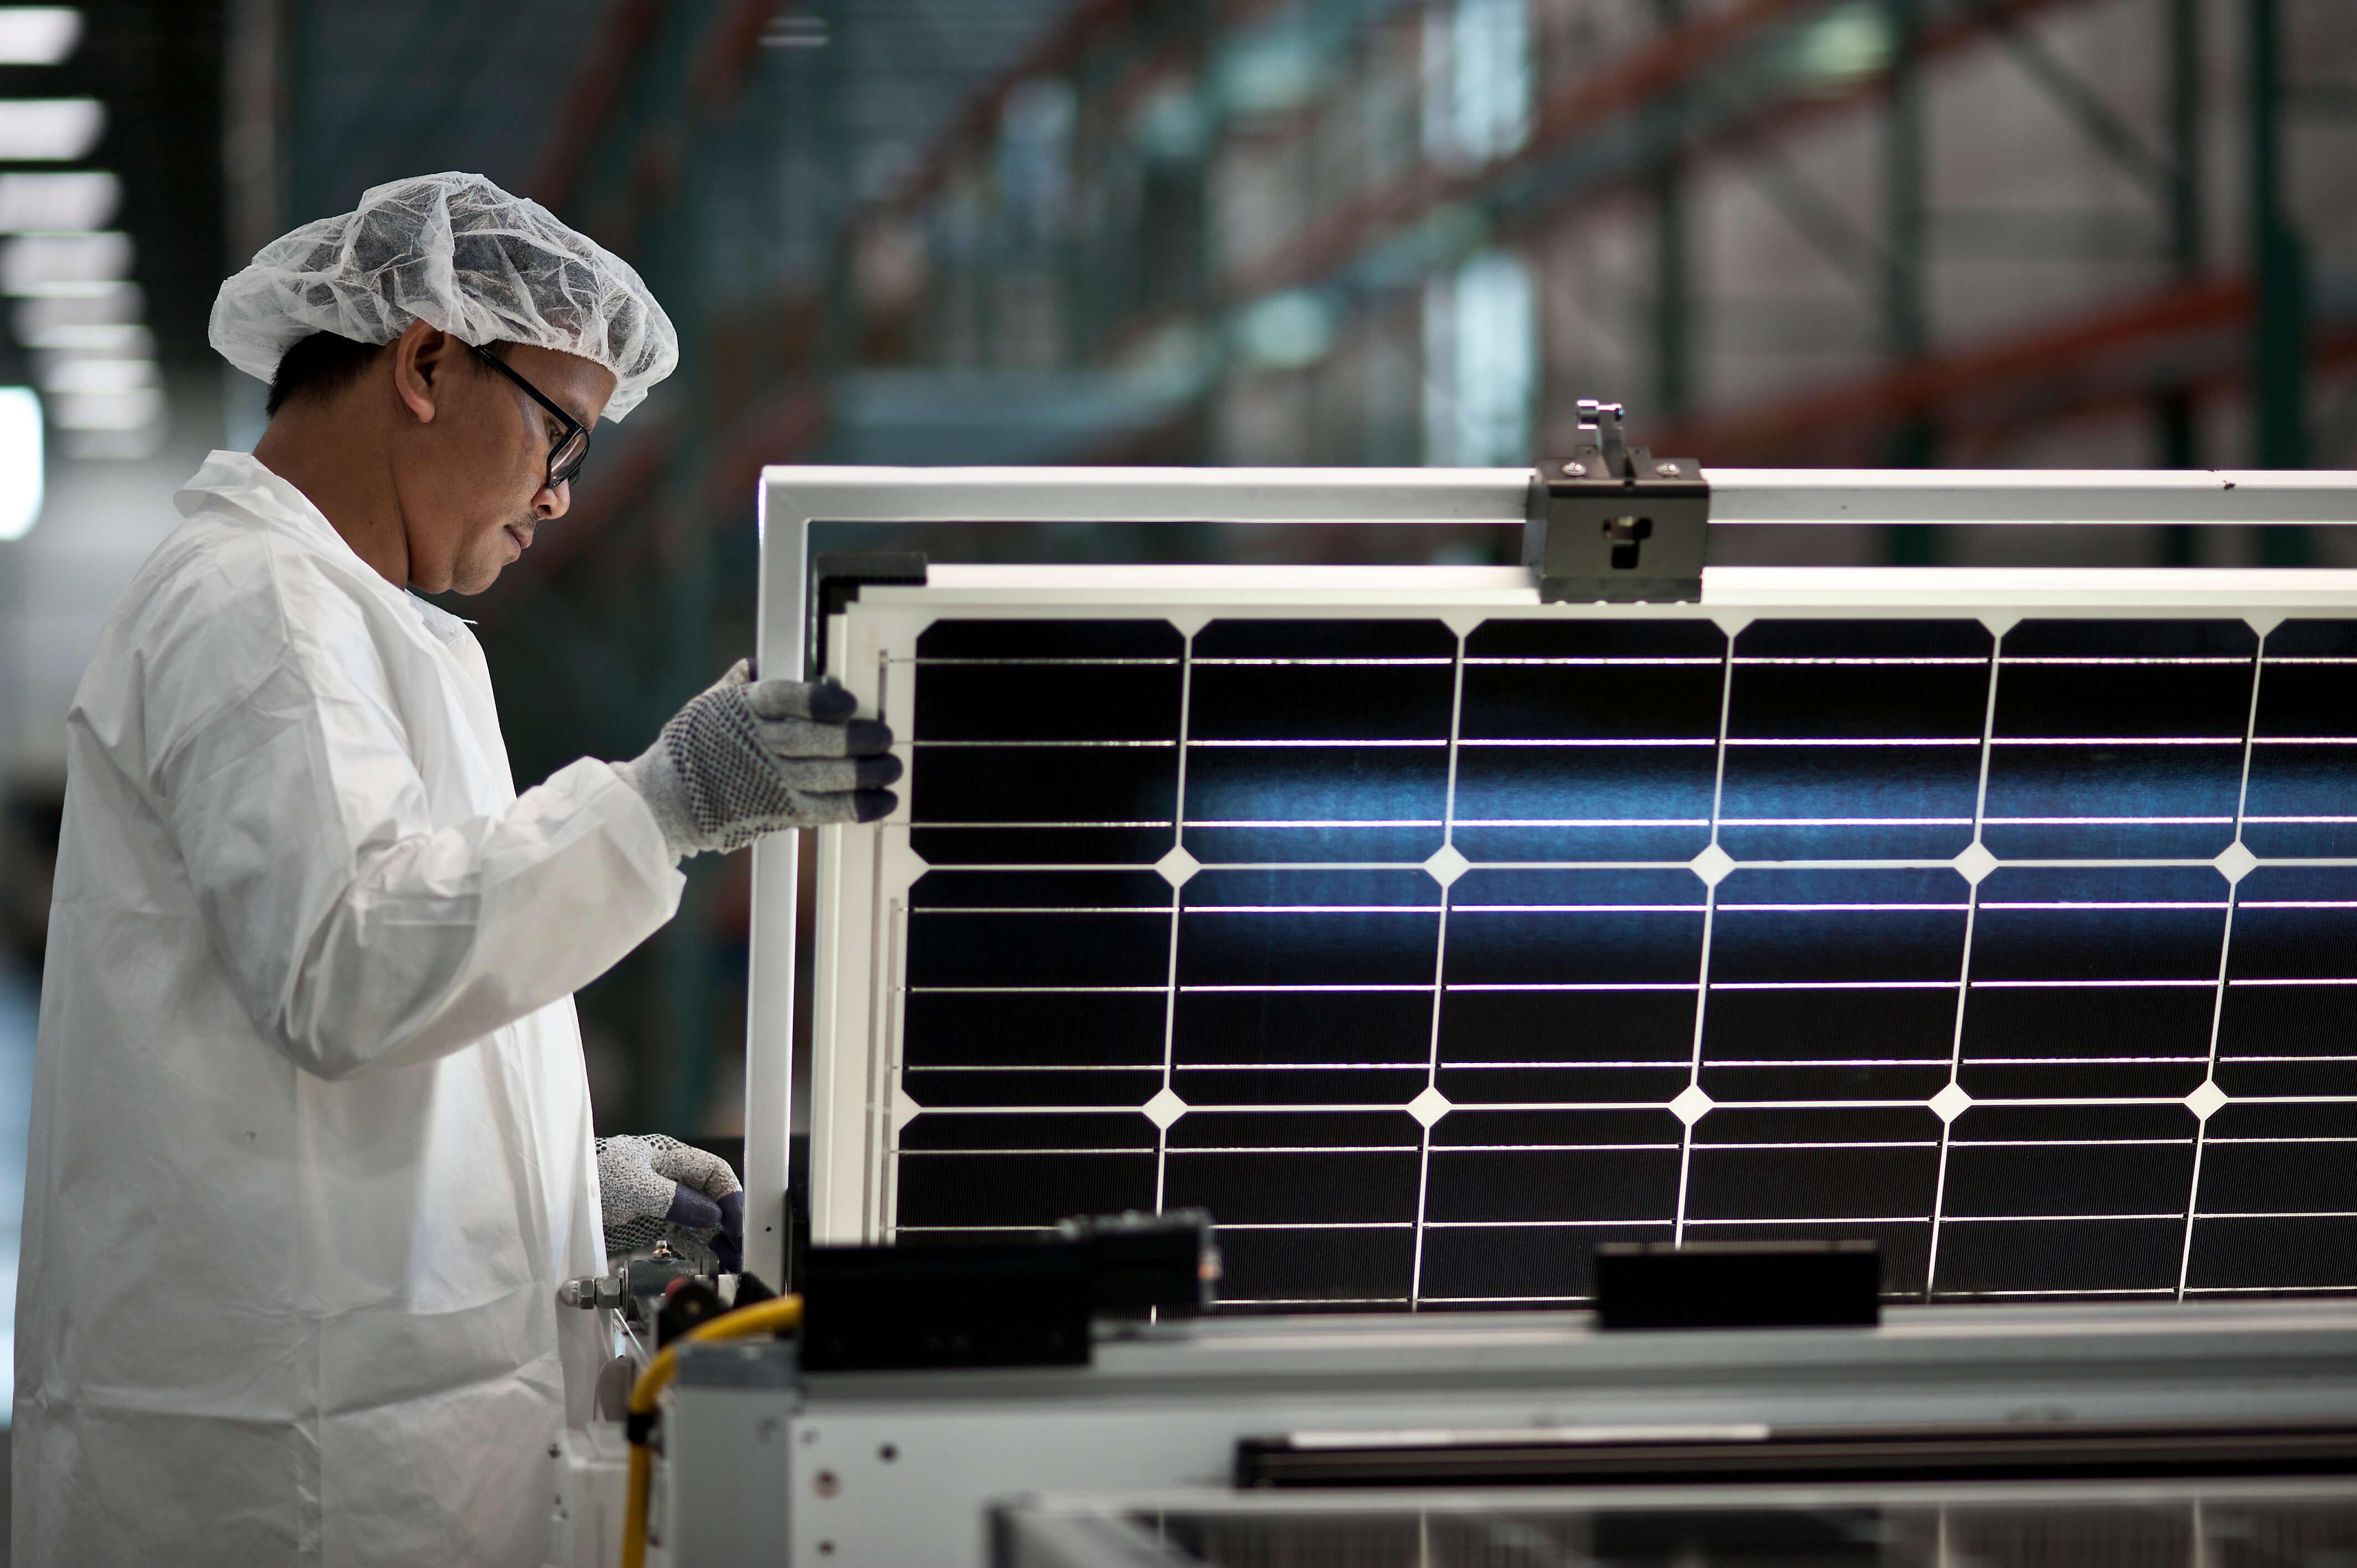 solarworld-hillsboro-factory-module-inspection SolarWorld Americas Pushes Forward Despite Parent's Insolvency